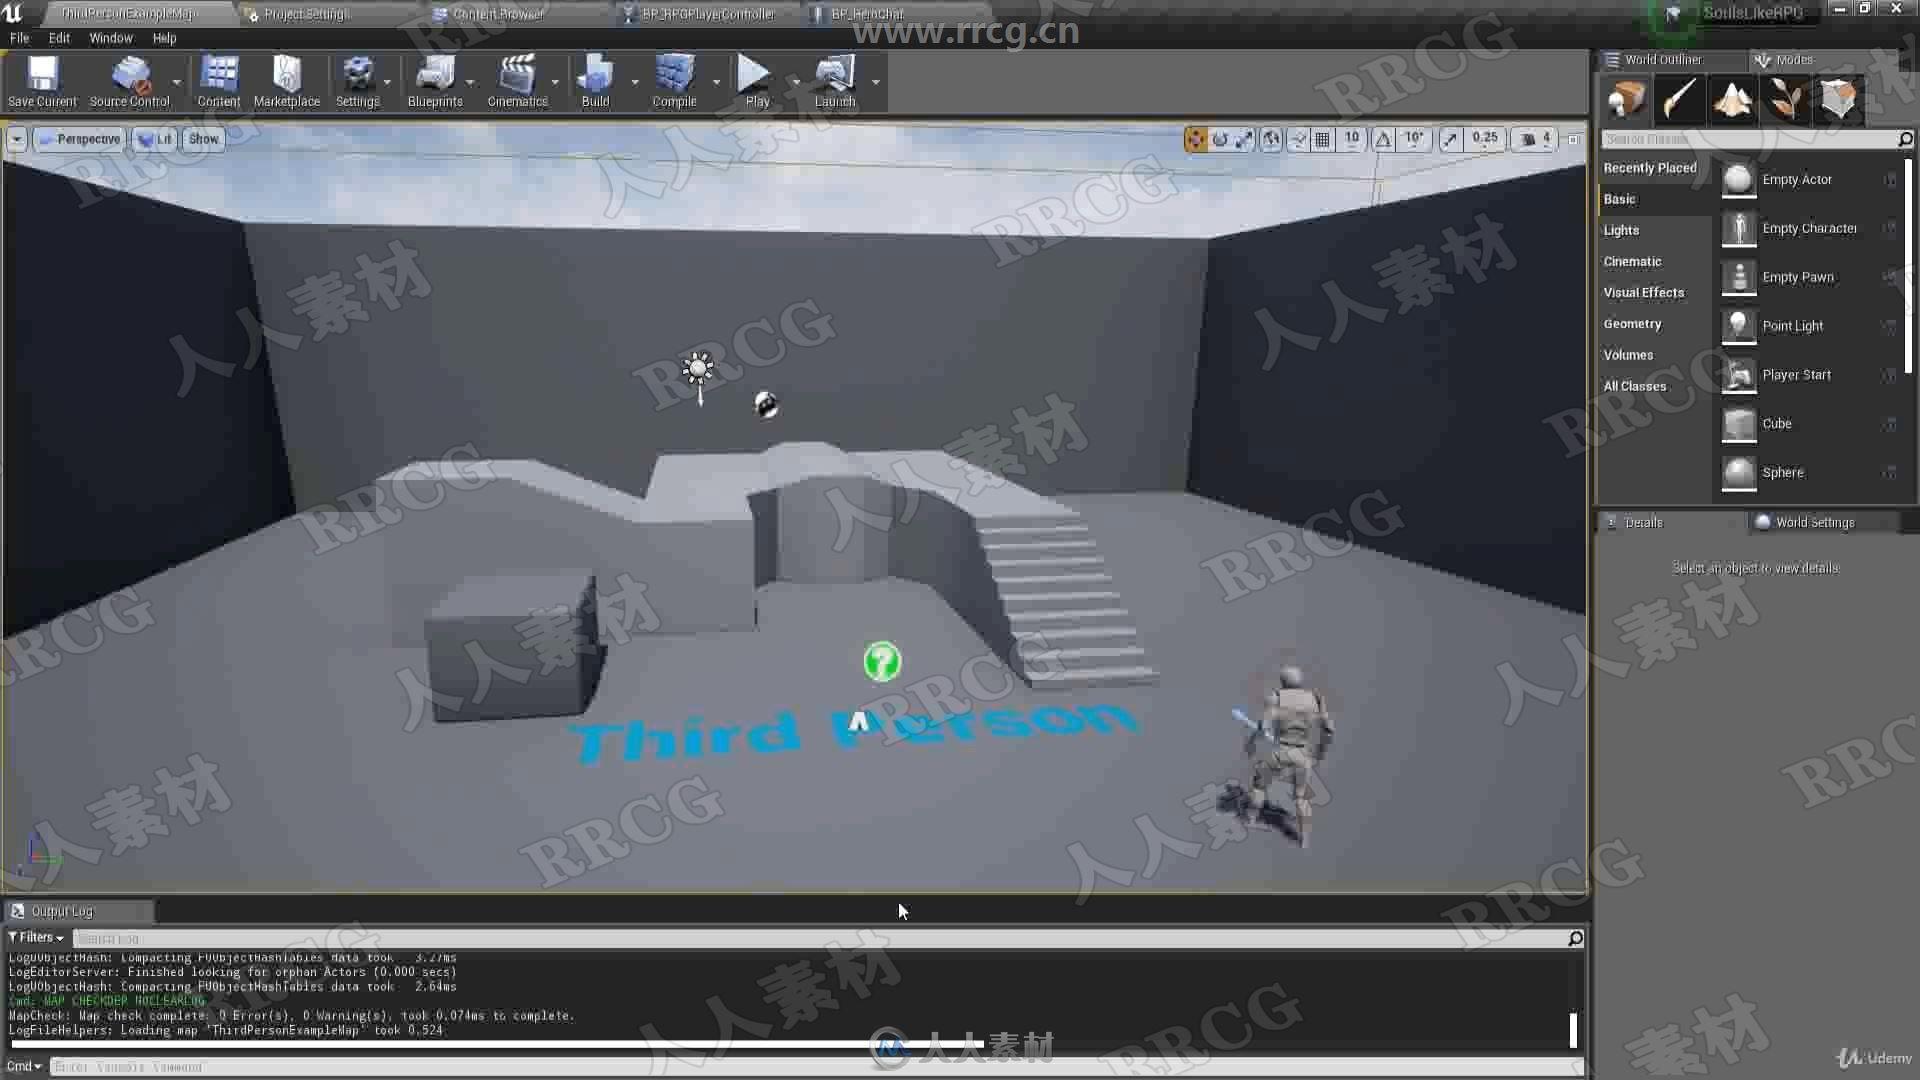 Unreal Engine角色扮演RPG网络游戏完整制作工作流程视频教程